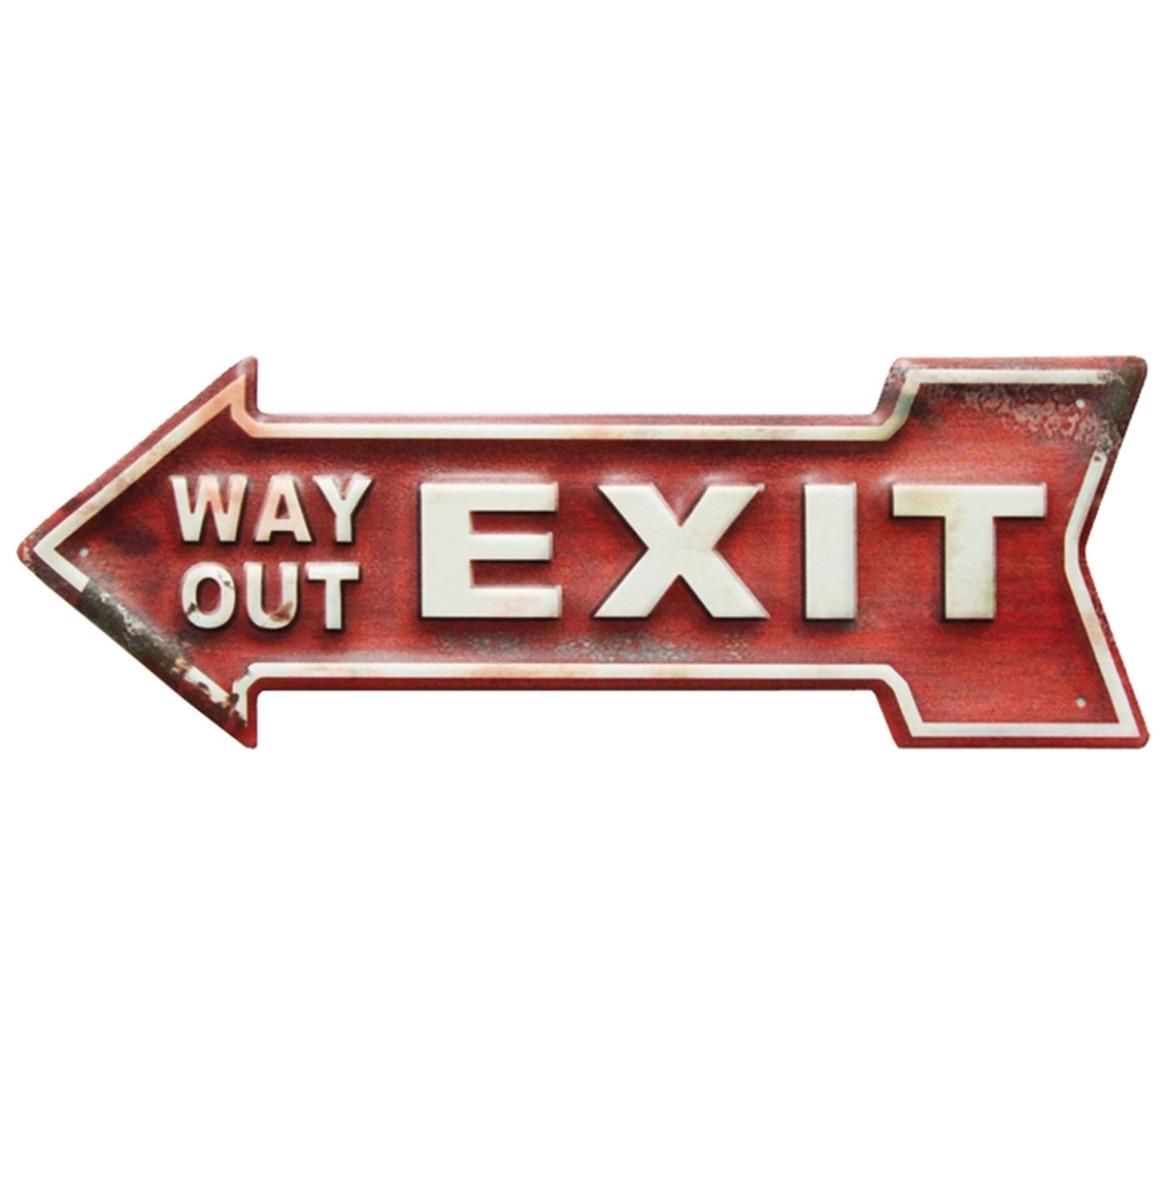 Exit Way Out Arrow Metalen Bord Met Reliëf - 40 x 14 cm